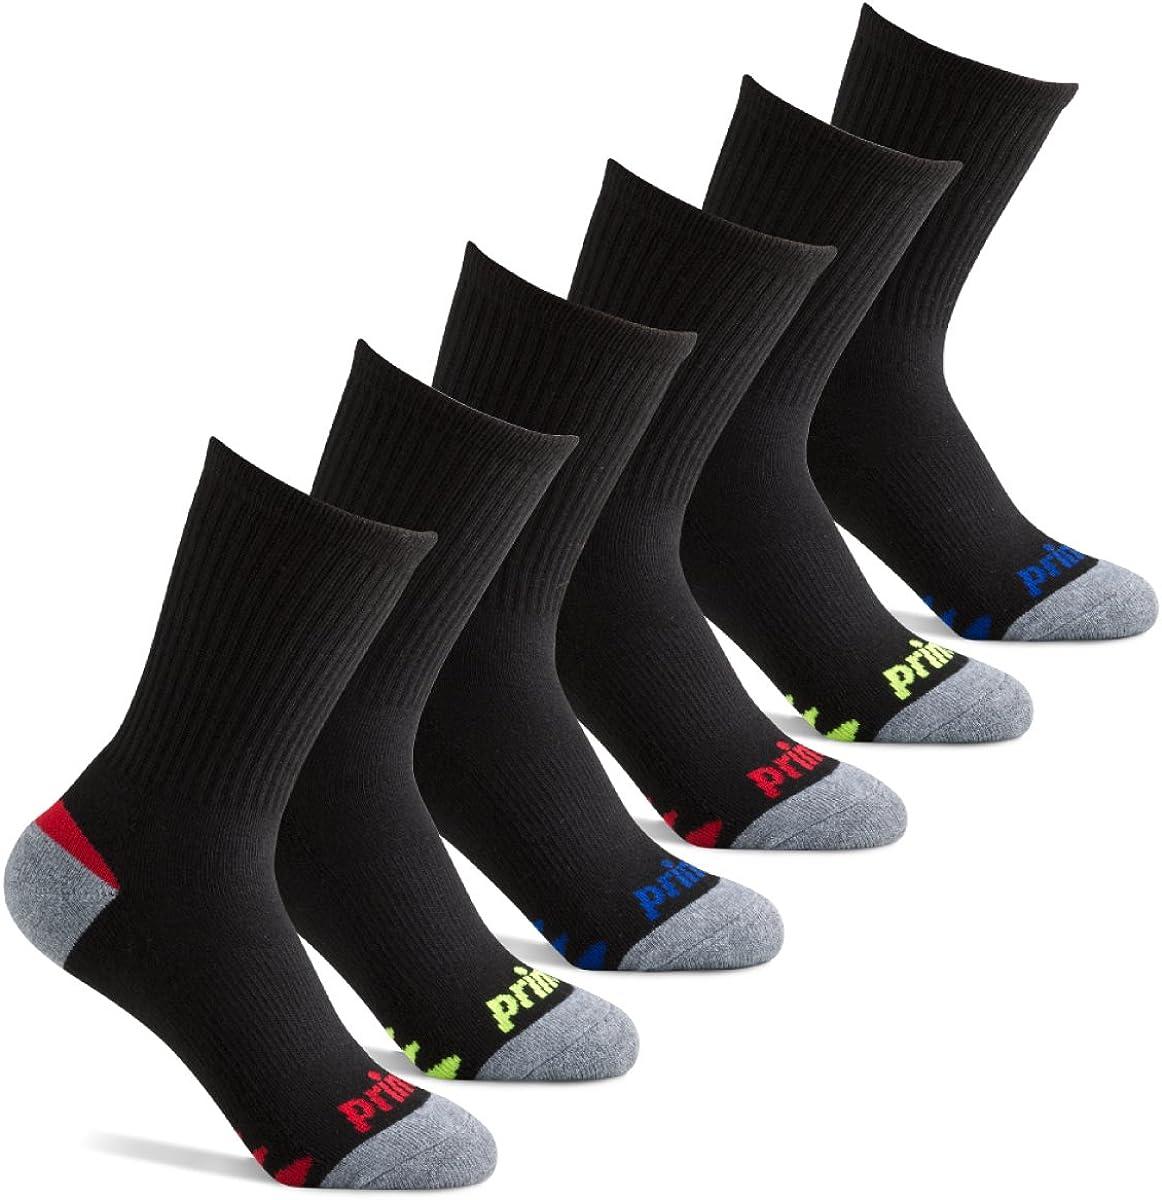 Amazon.com: Prince Boys' Crew Length Athletic Socks with Cushion for Active  Kids: Clothing